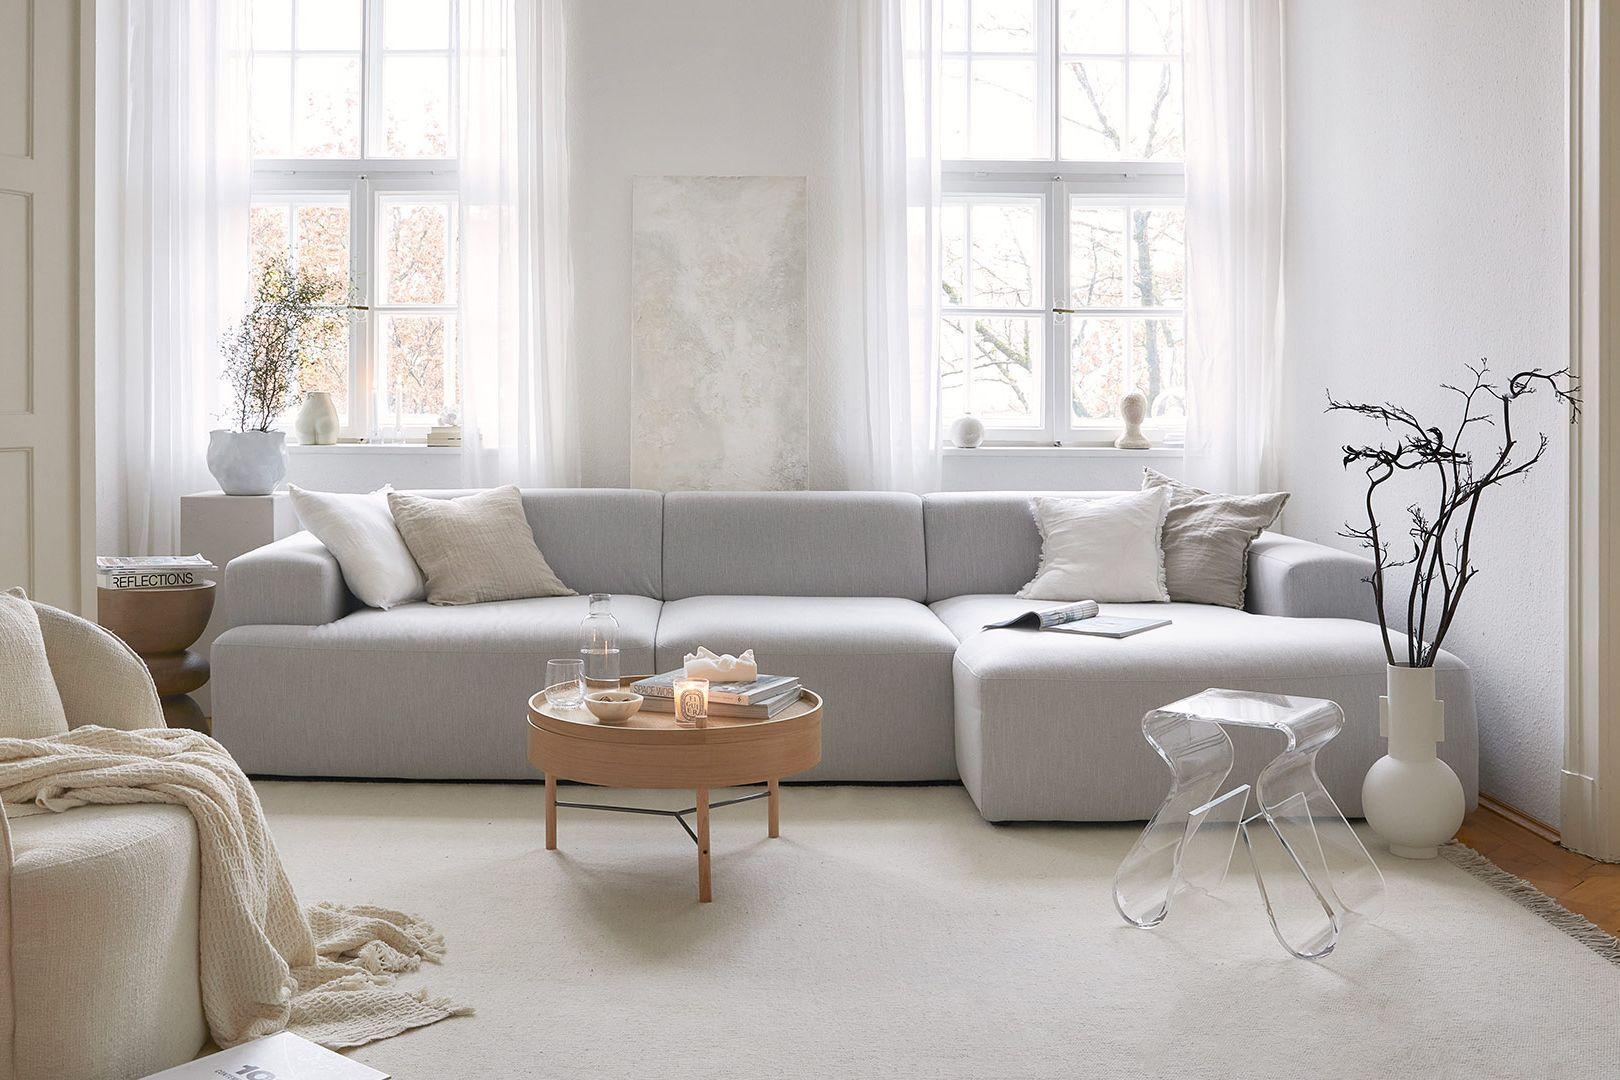 Cozy in bianco